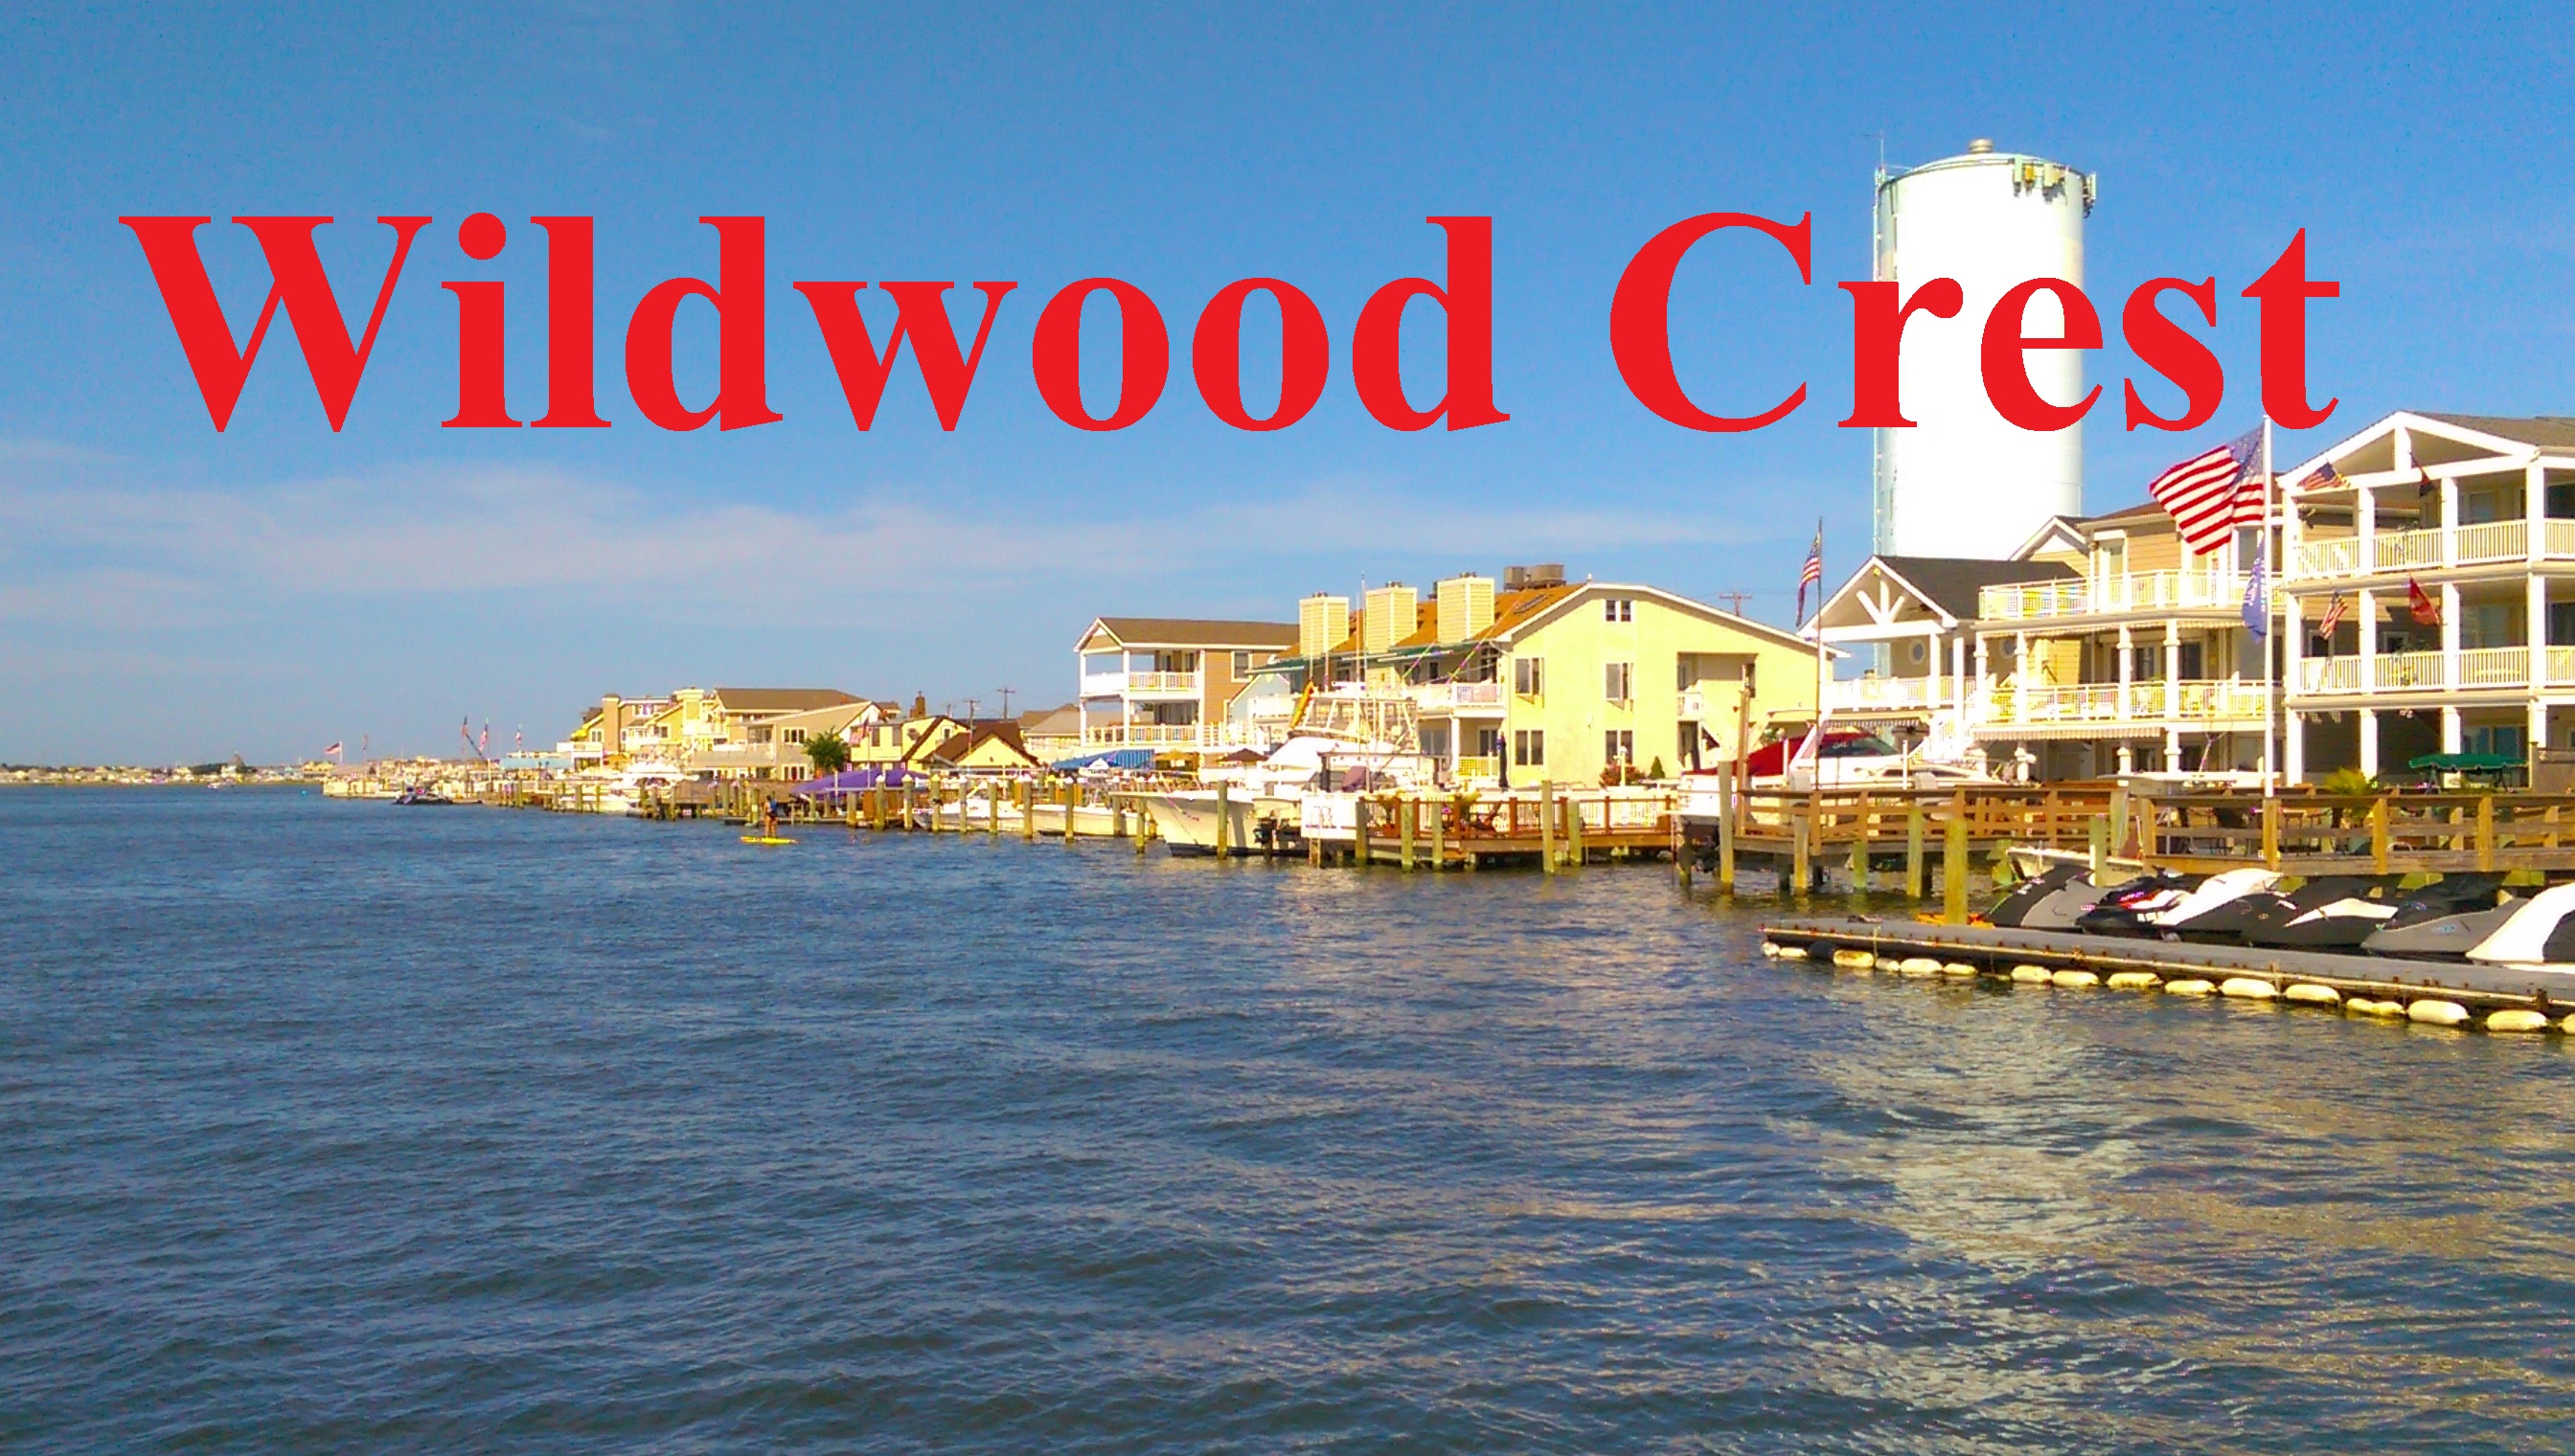 Wildwood Crest Sunset Lake